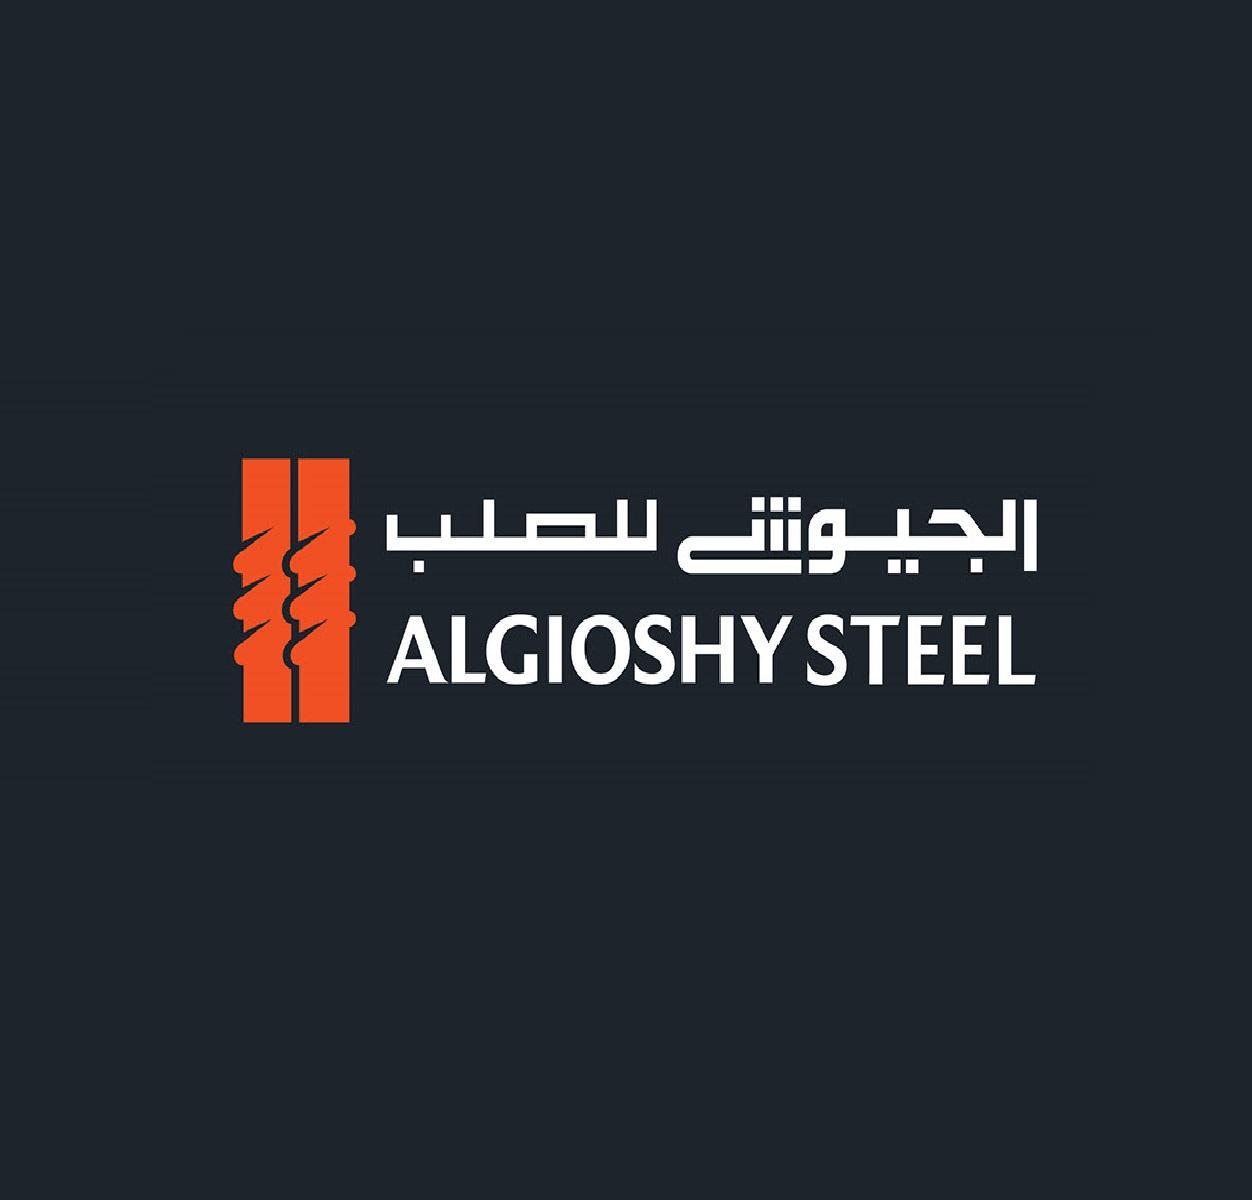 AlGioshy Steel